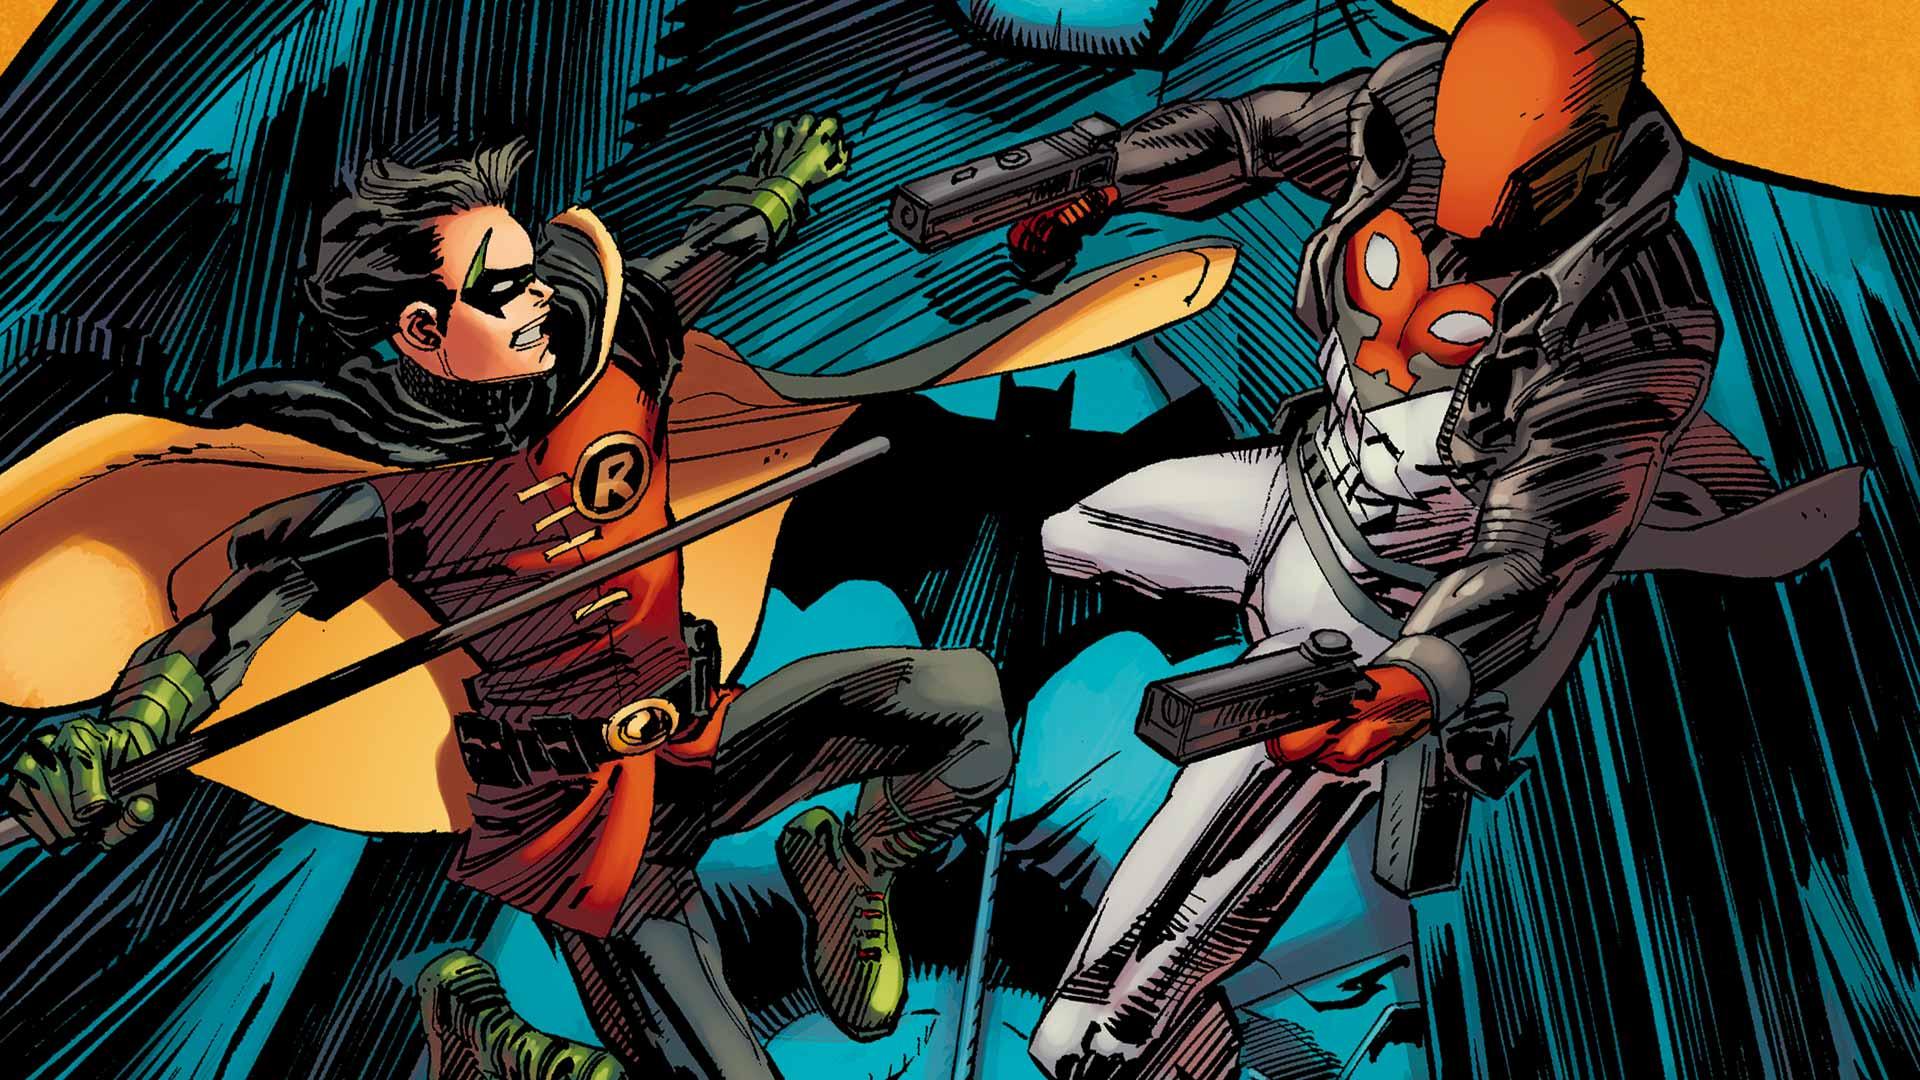 Batman And Robin Wallpaper Desktop Background ~ Sdeerwallpaper